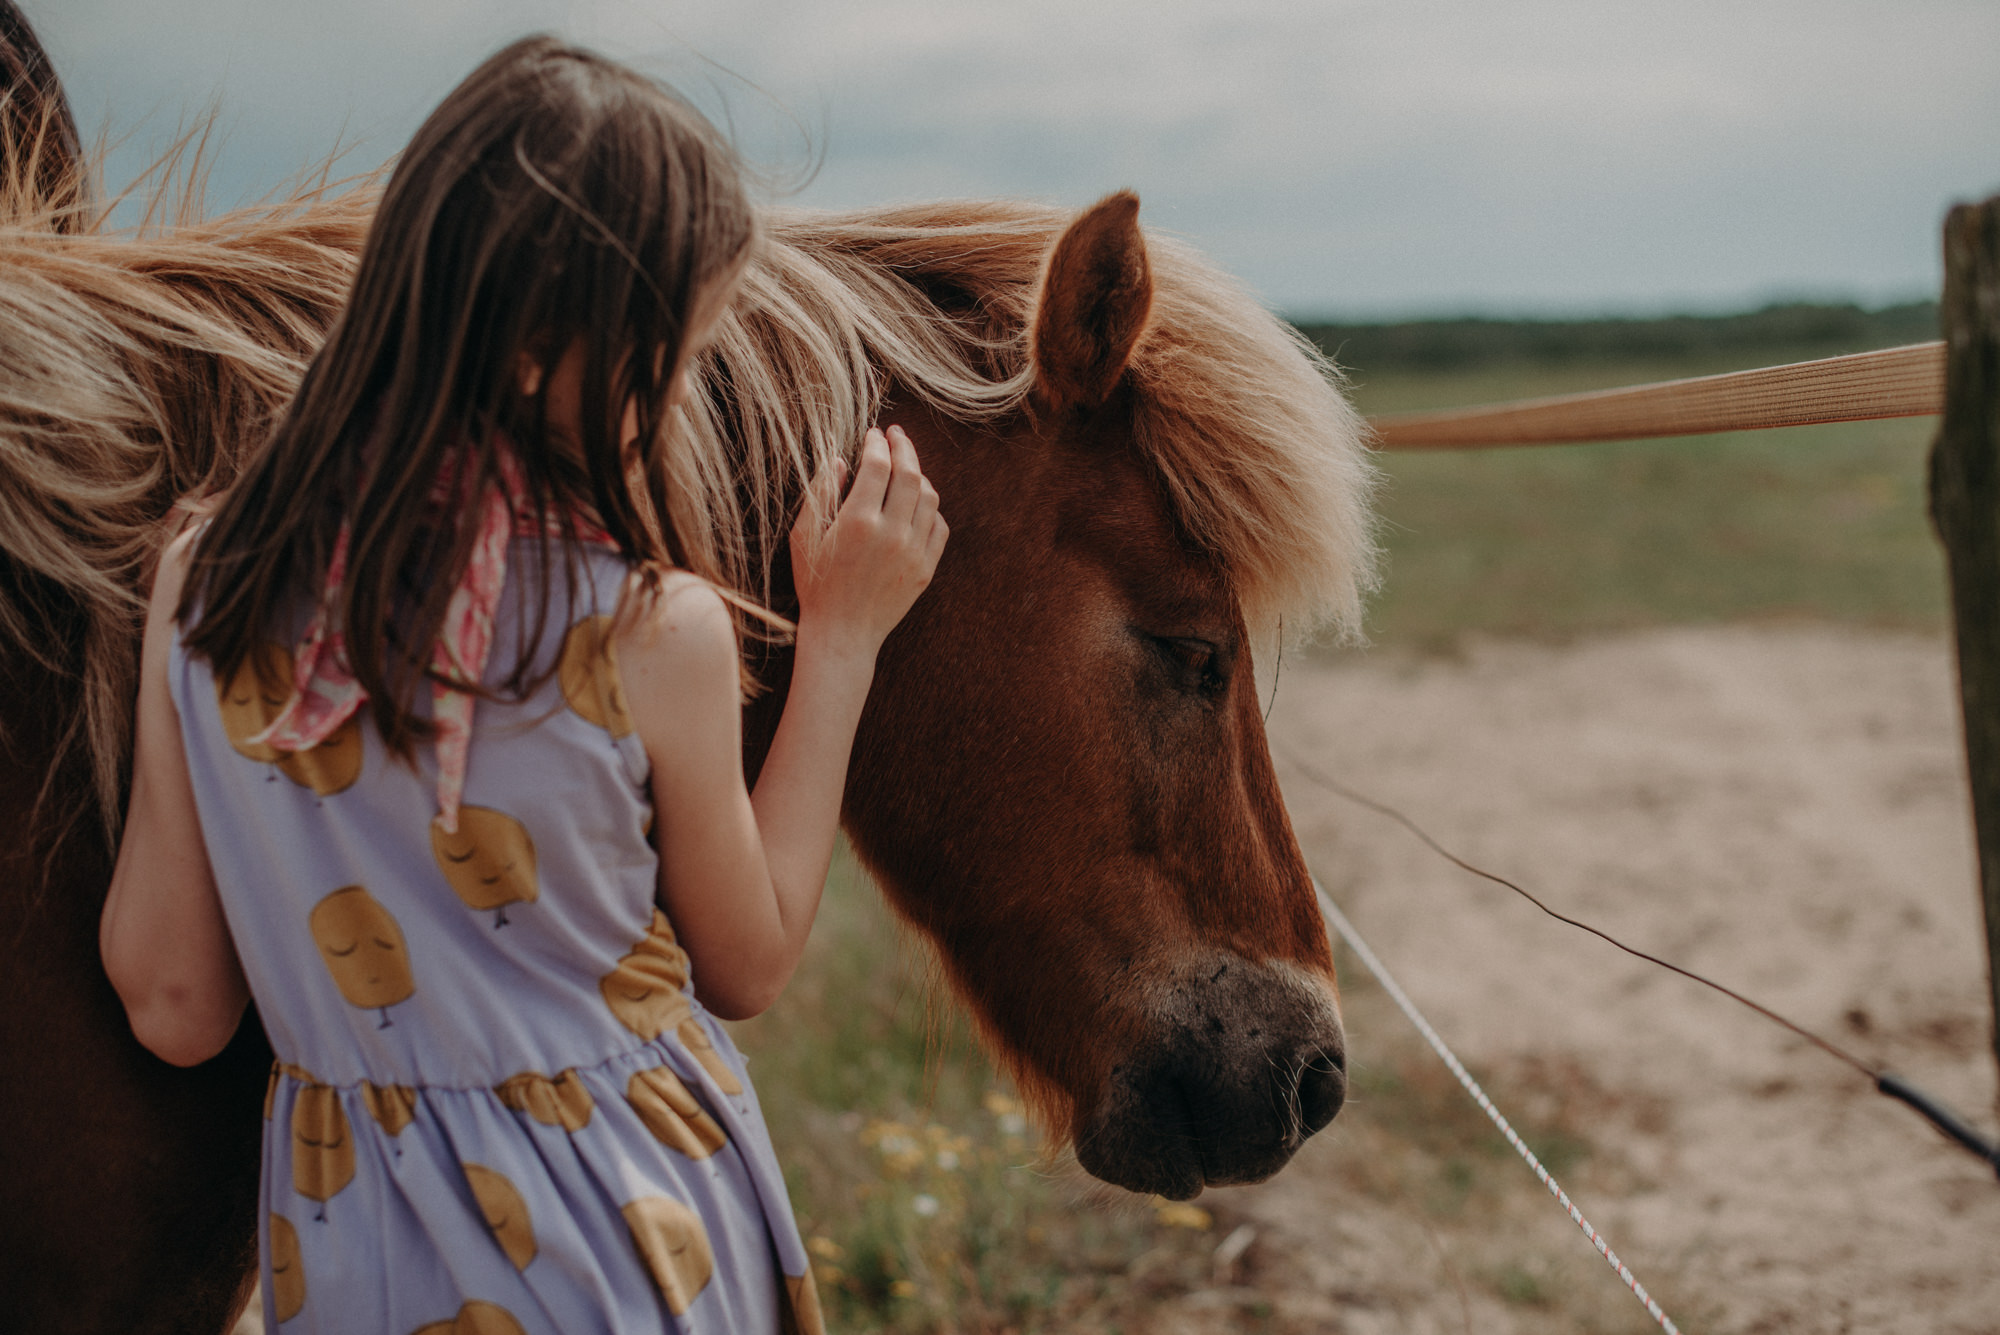 Fotoshooting Ideen Outdoor Familienfotoshooting Basel, Mädchen mit Pferd, Fotograf in basel